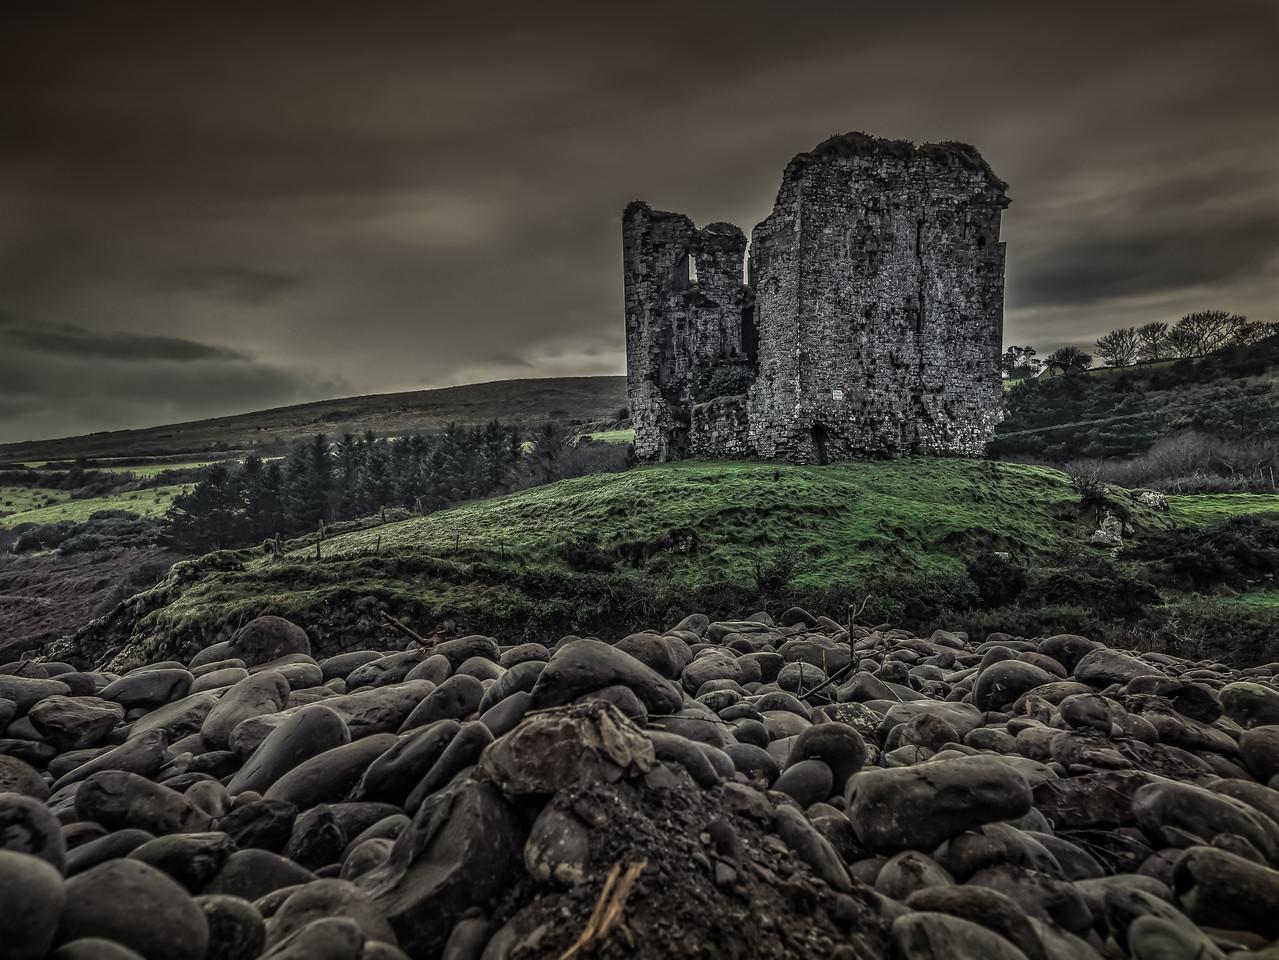 A spooky Castle in the Dingle Peninsula - Happy Halloween